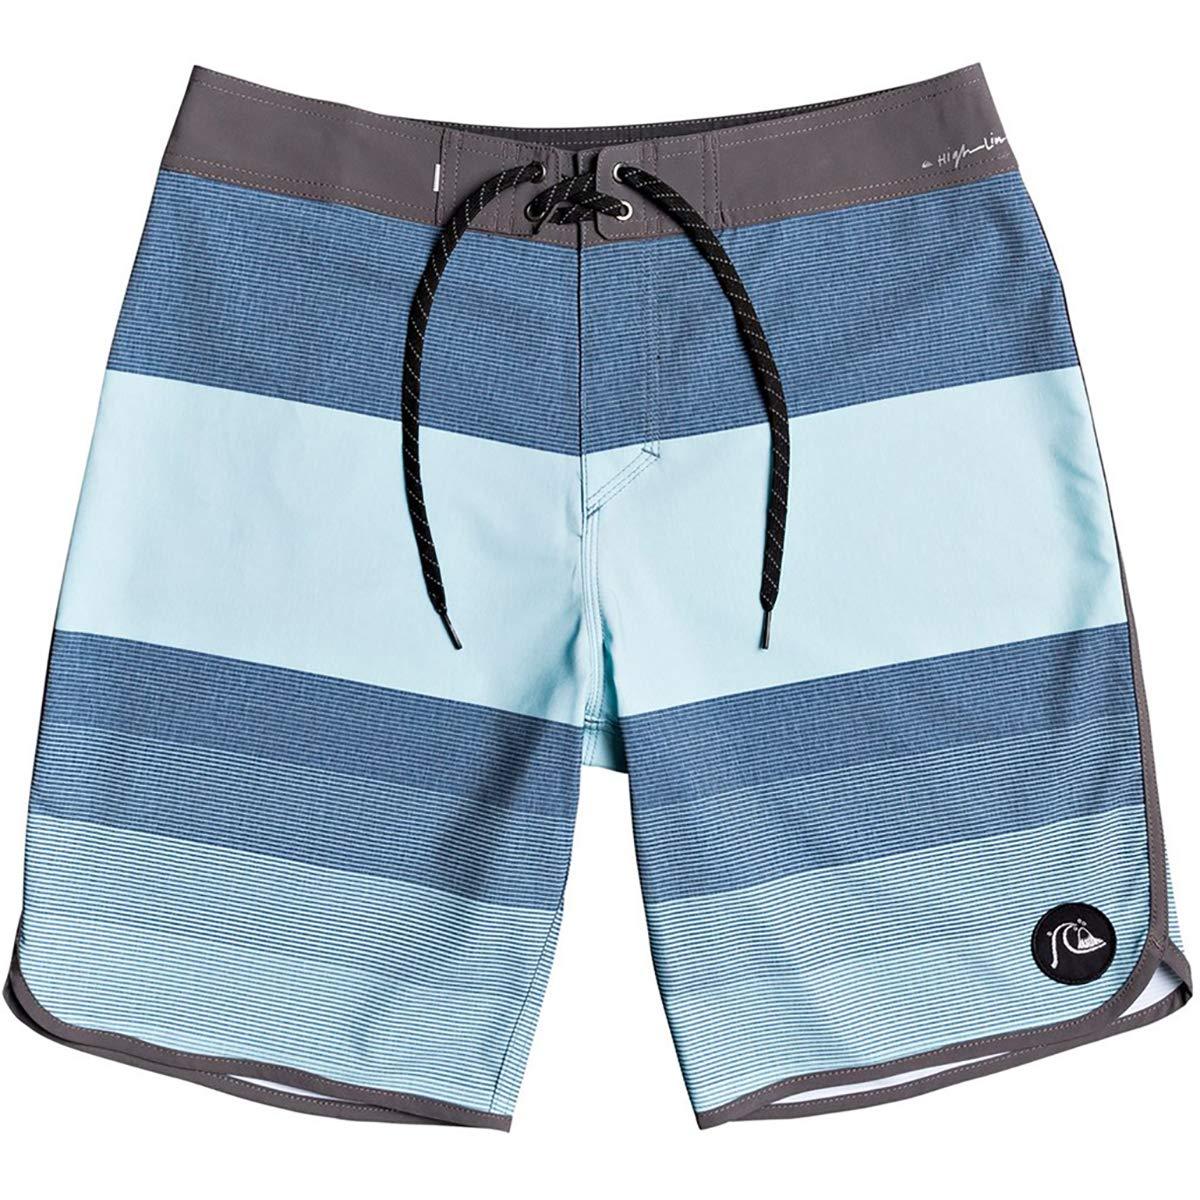 Quiksilver Mens Highline Tijuana 20 Boardshort Swim Trunk